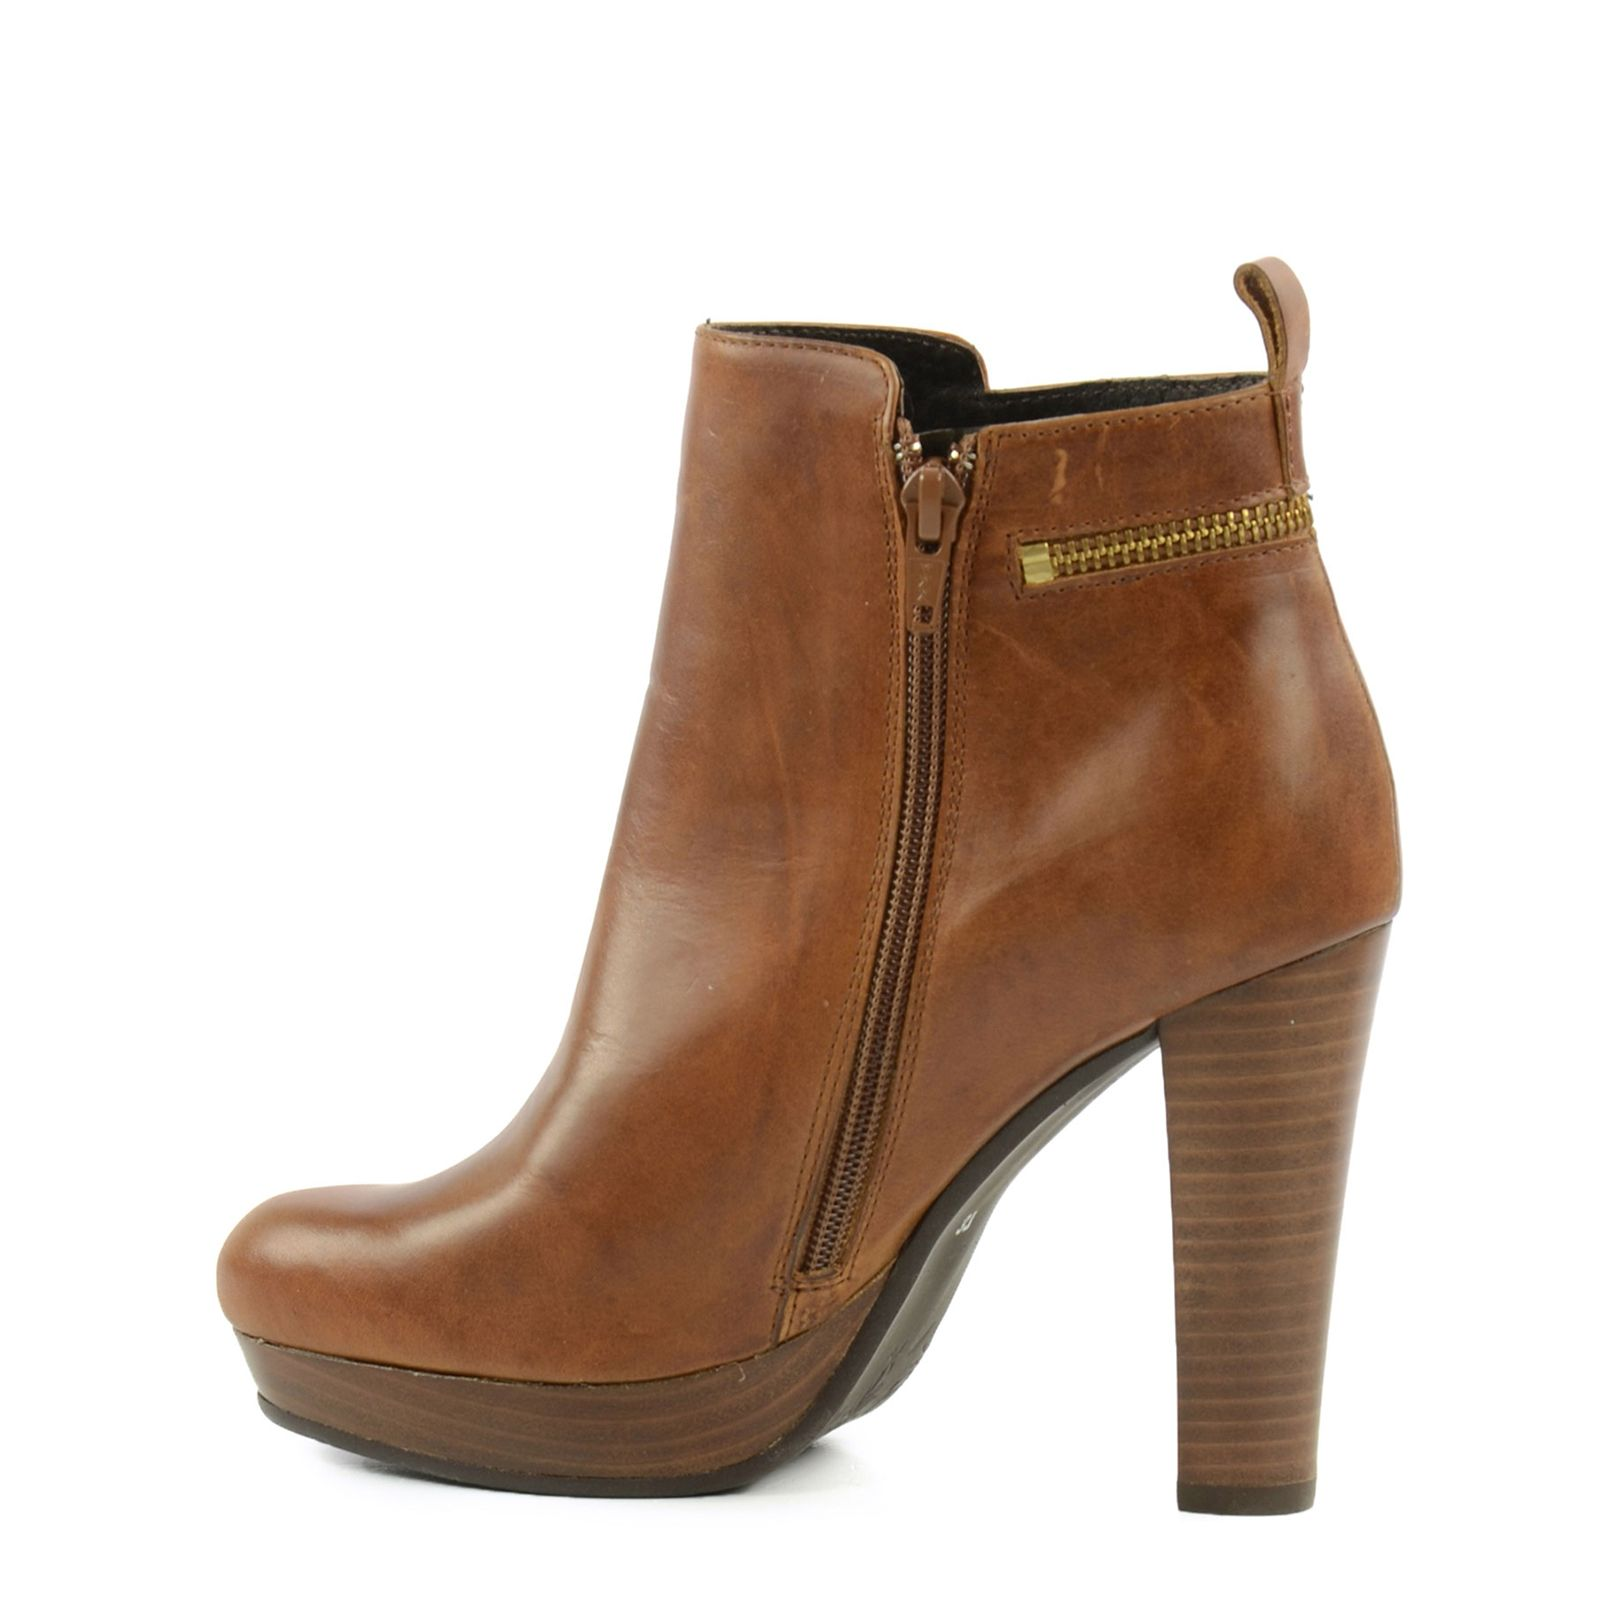 SACHA Hohe Stiefeletten braun | Schuhe, Hochhackige schuhe